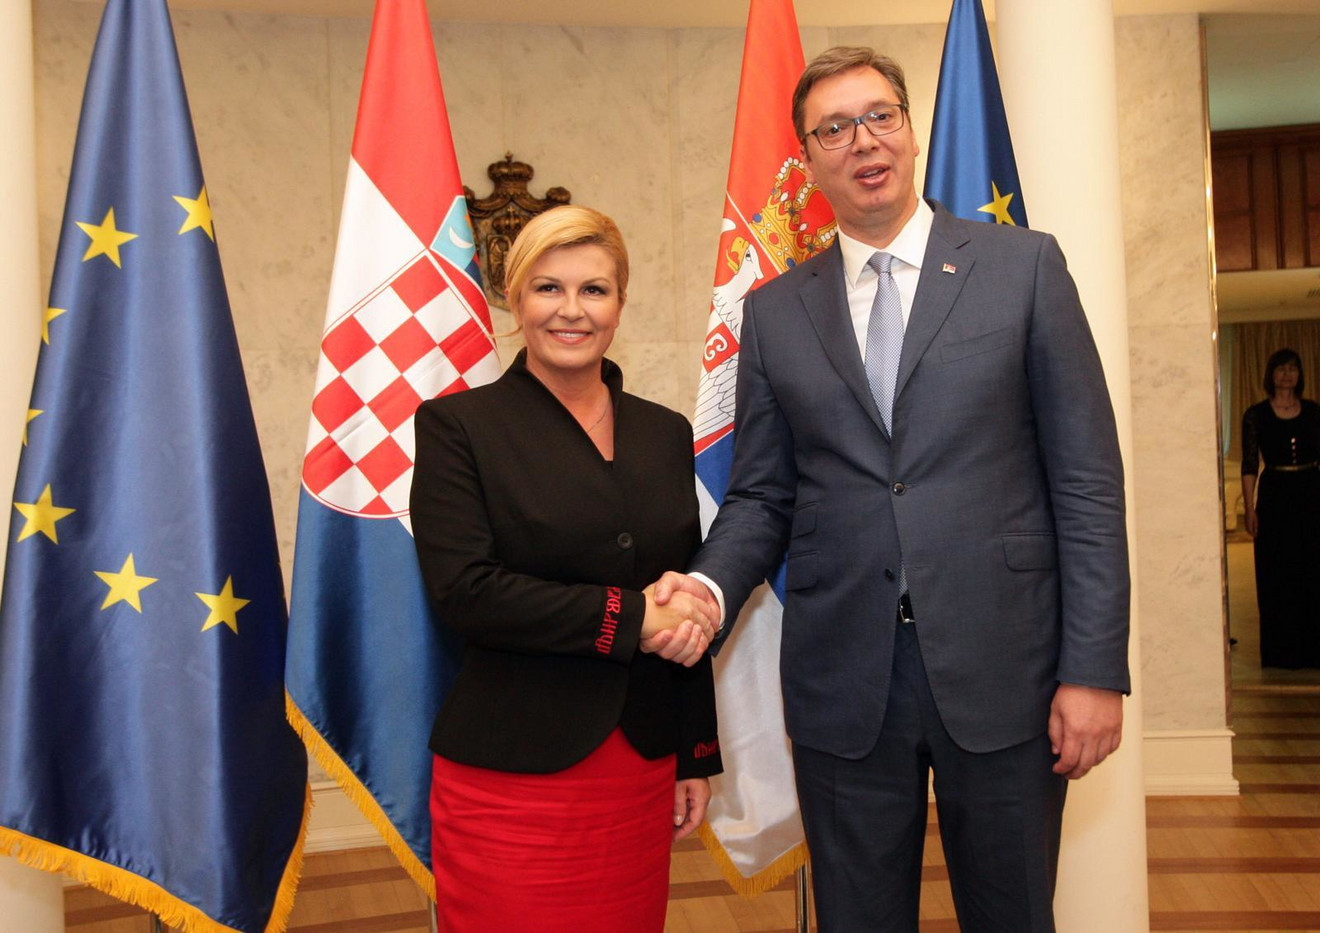 Sastanak predsednika u Beogradu